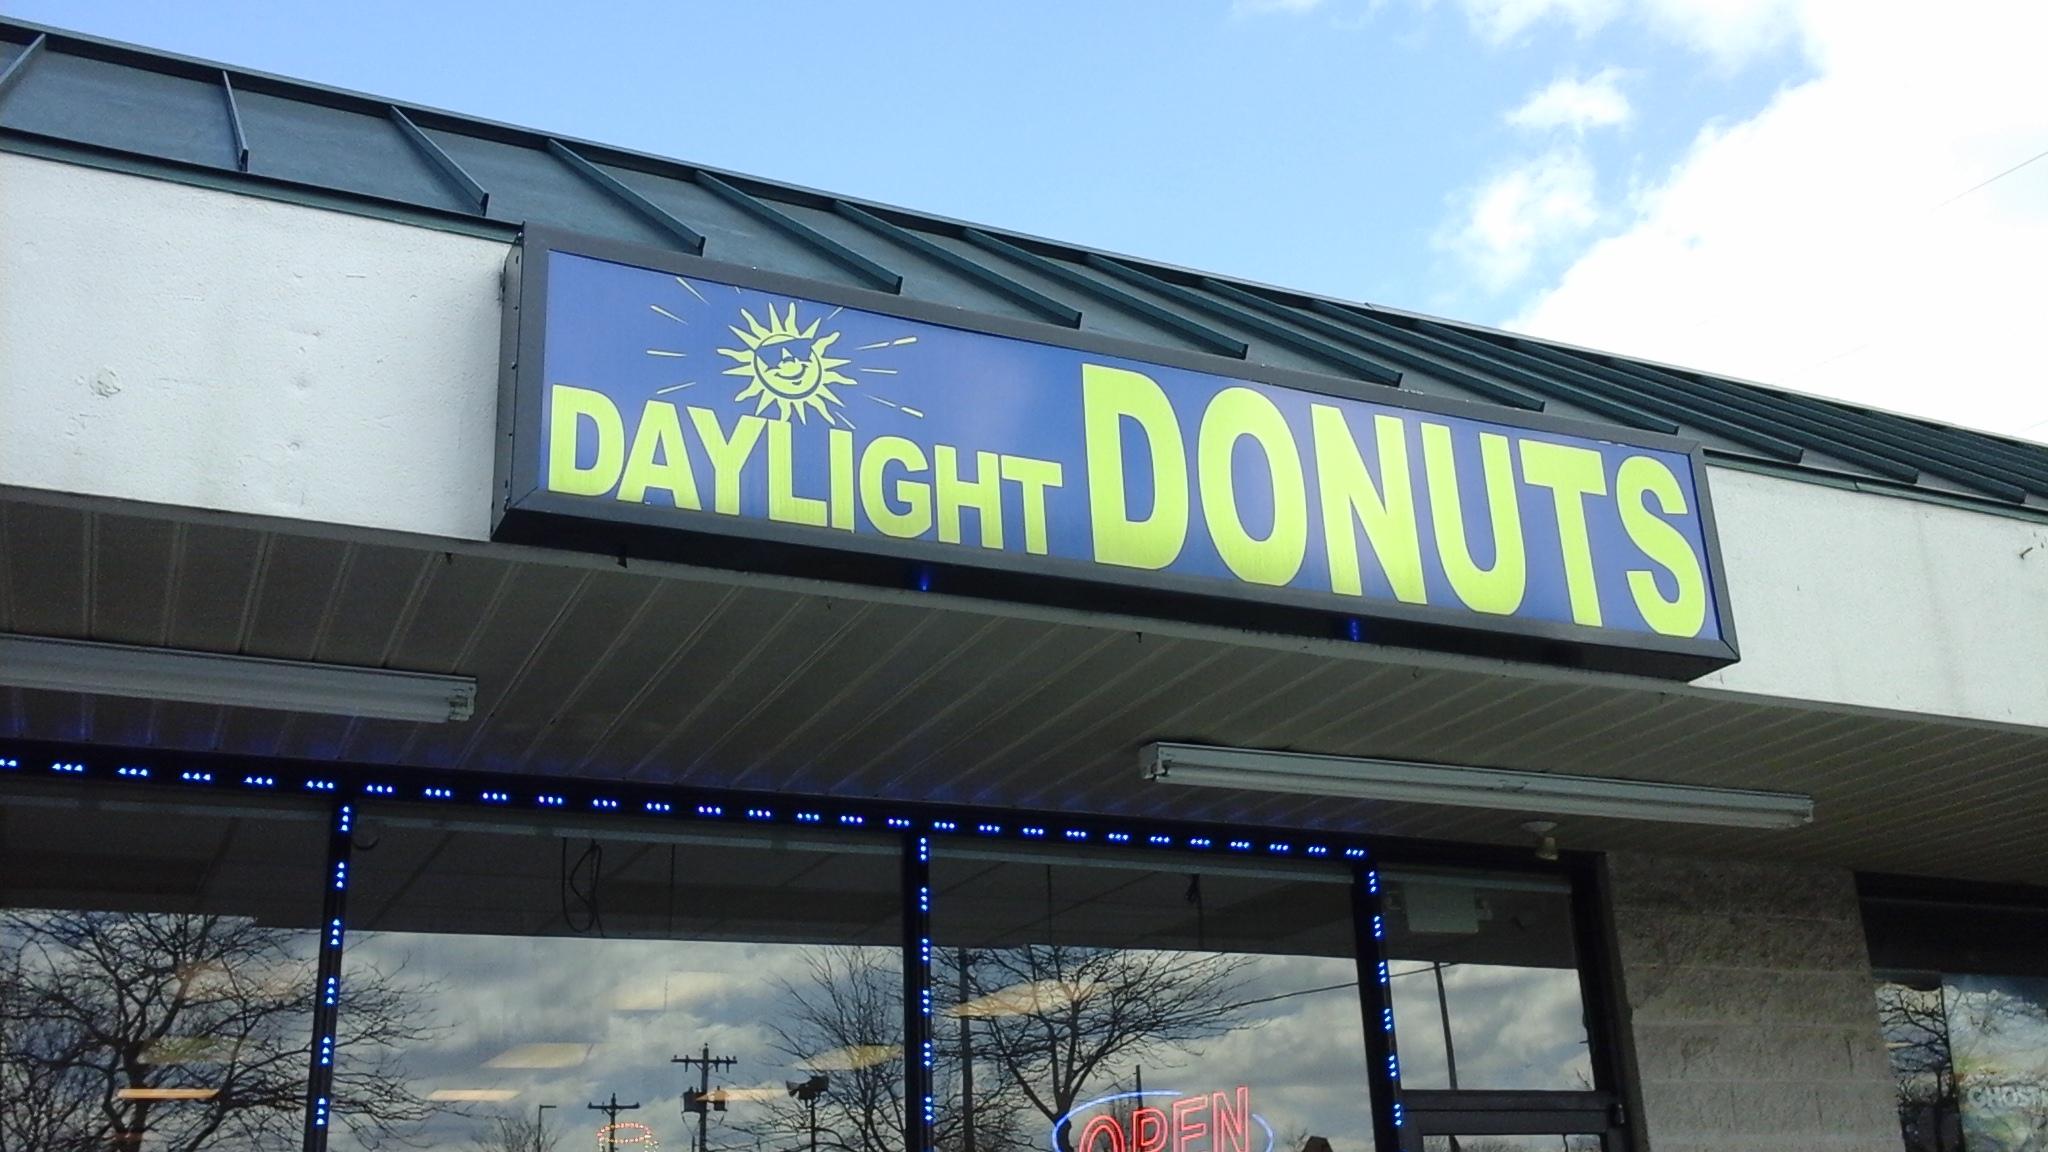 Daylight Donuts image 6